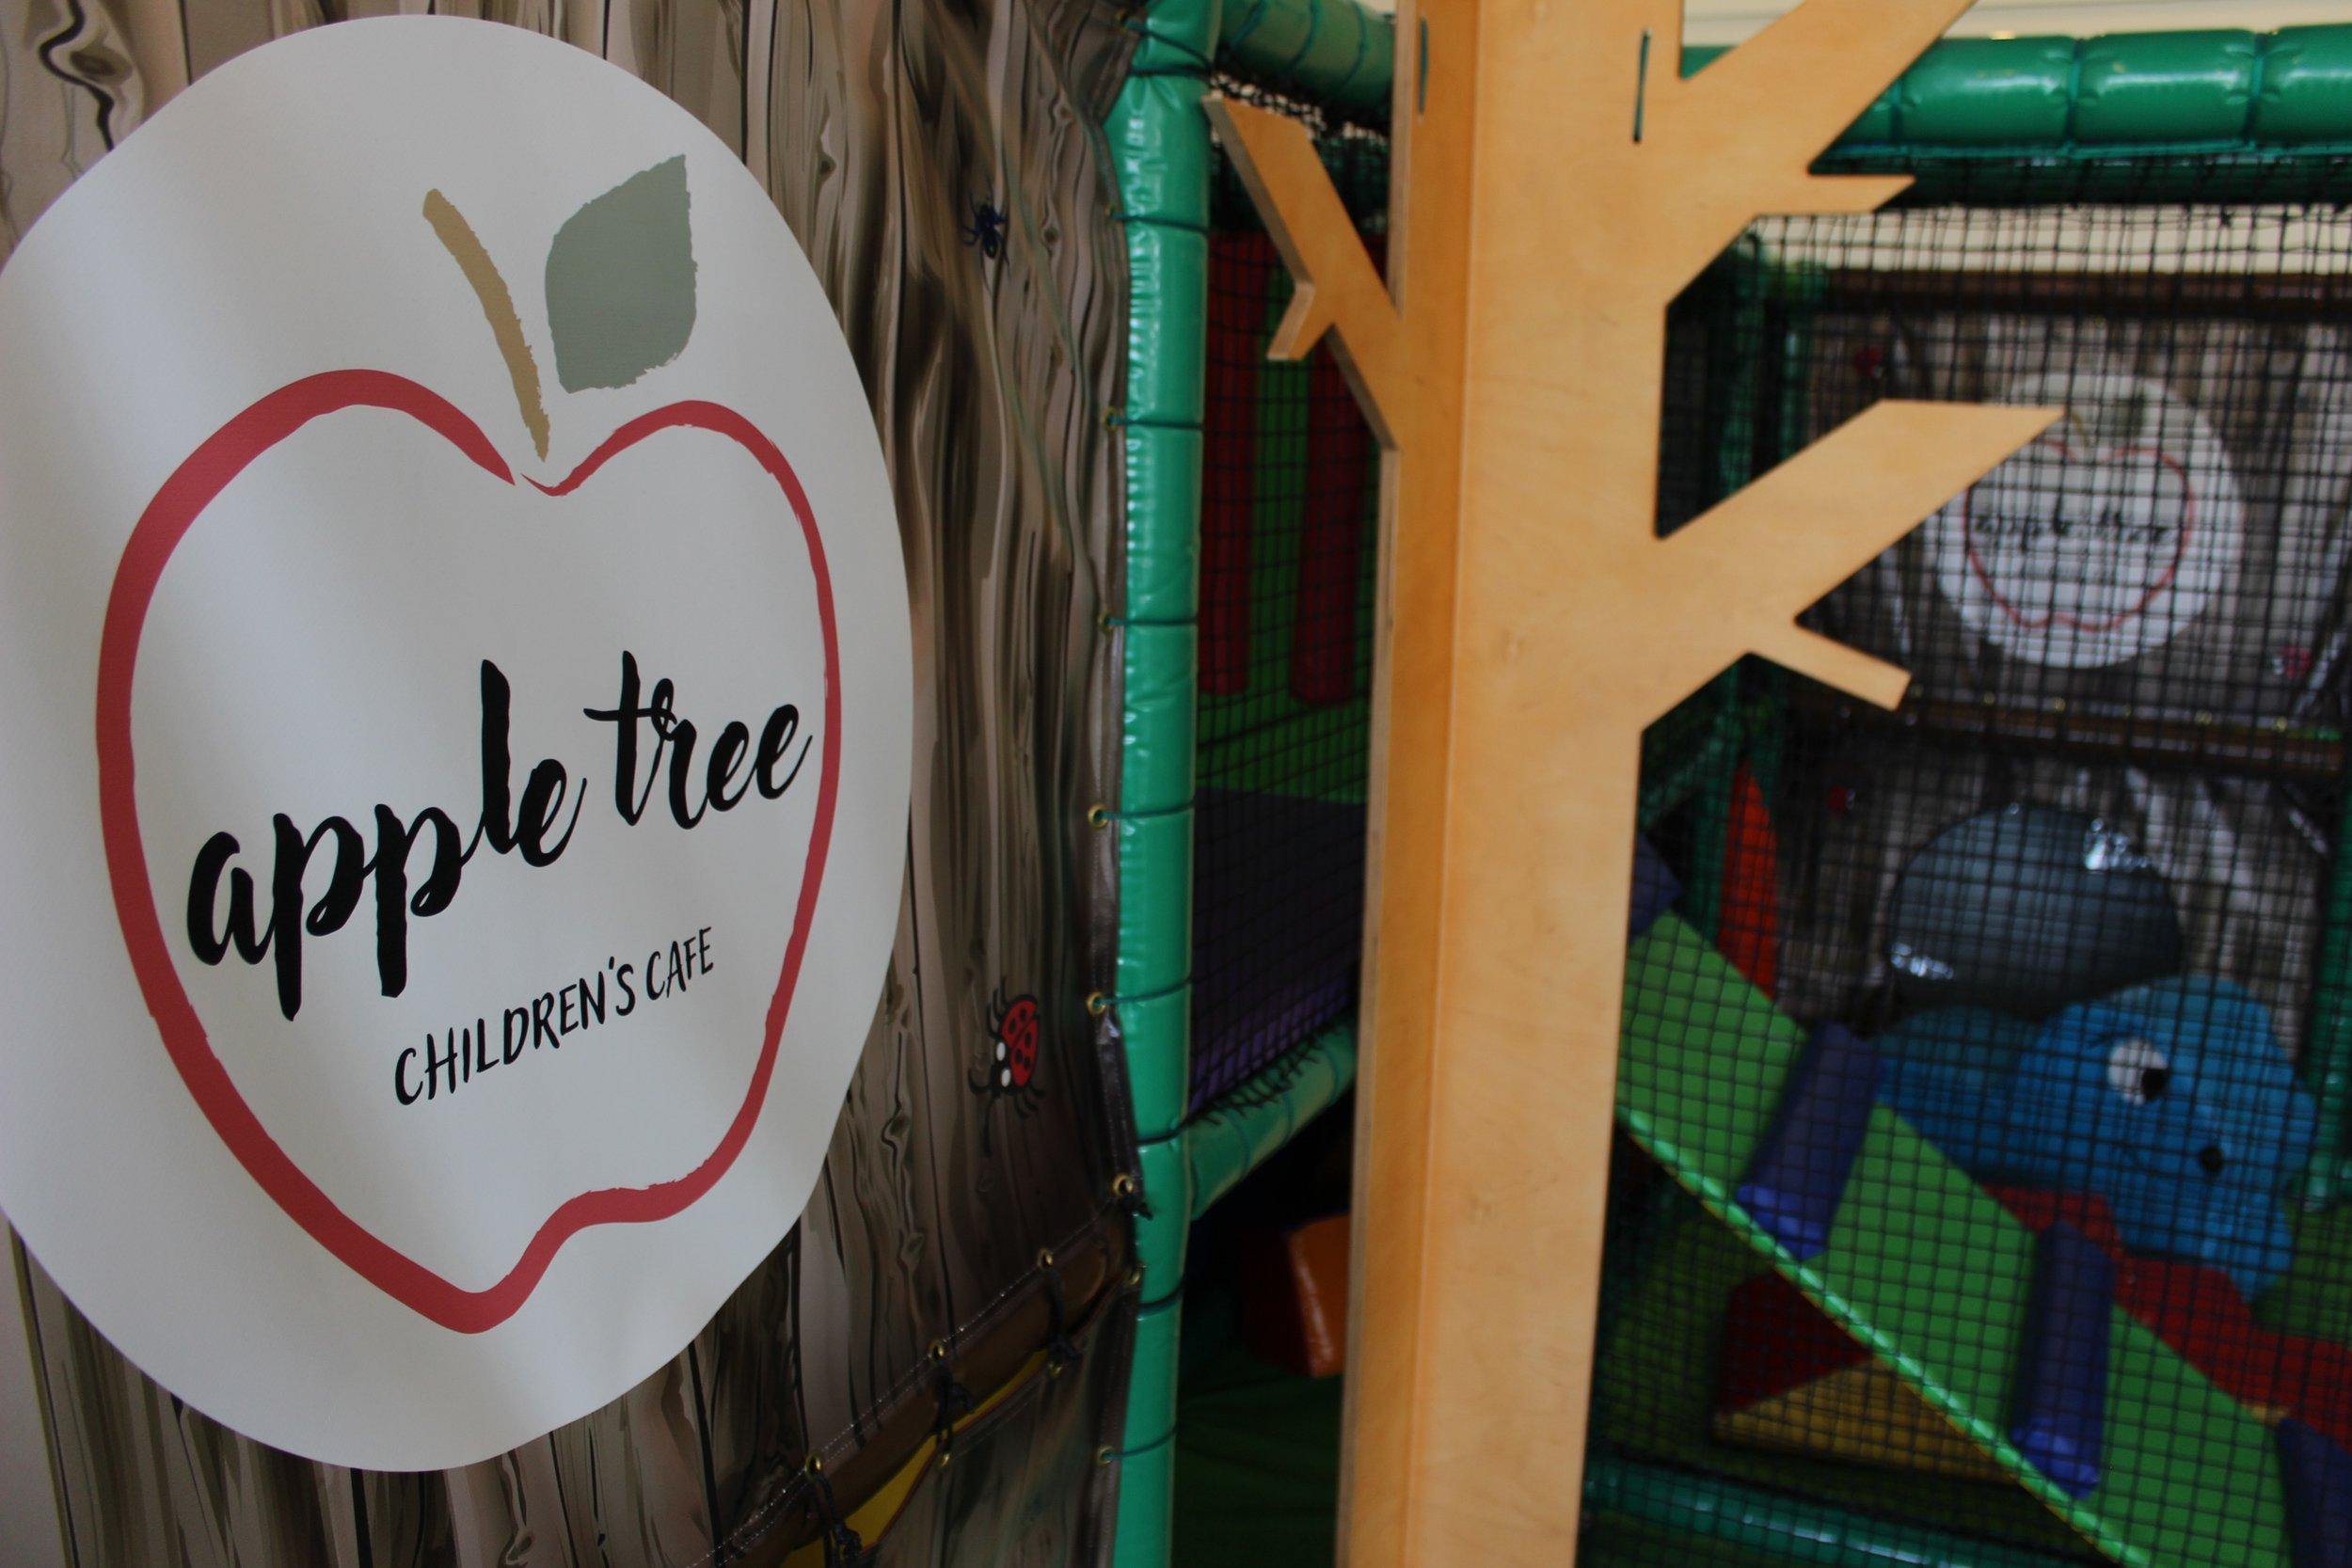 Apple Tree Children's Cafe in Herne Hill South London 8.jpg